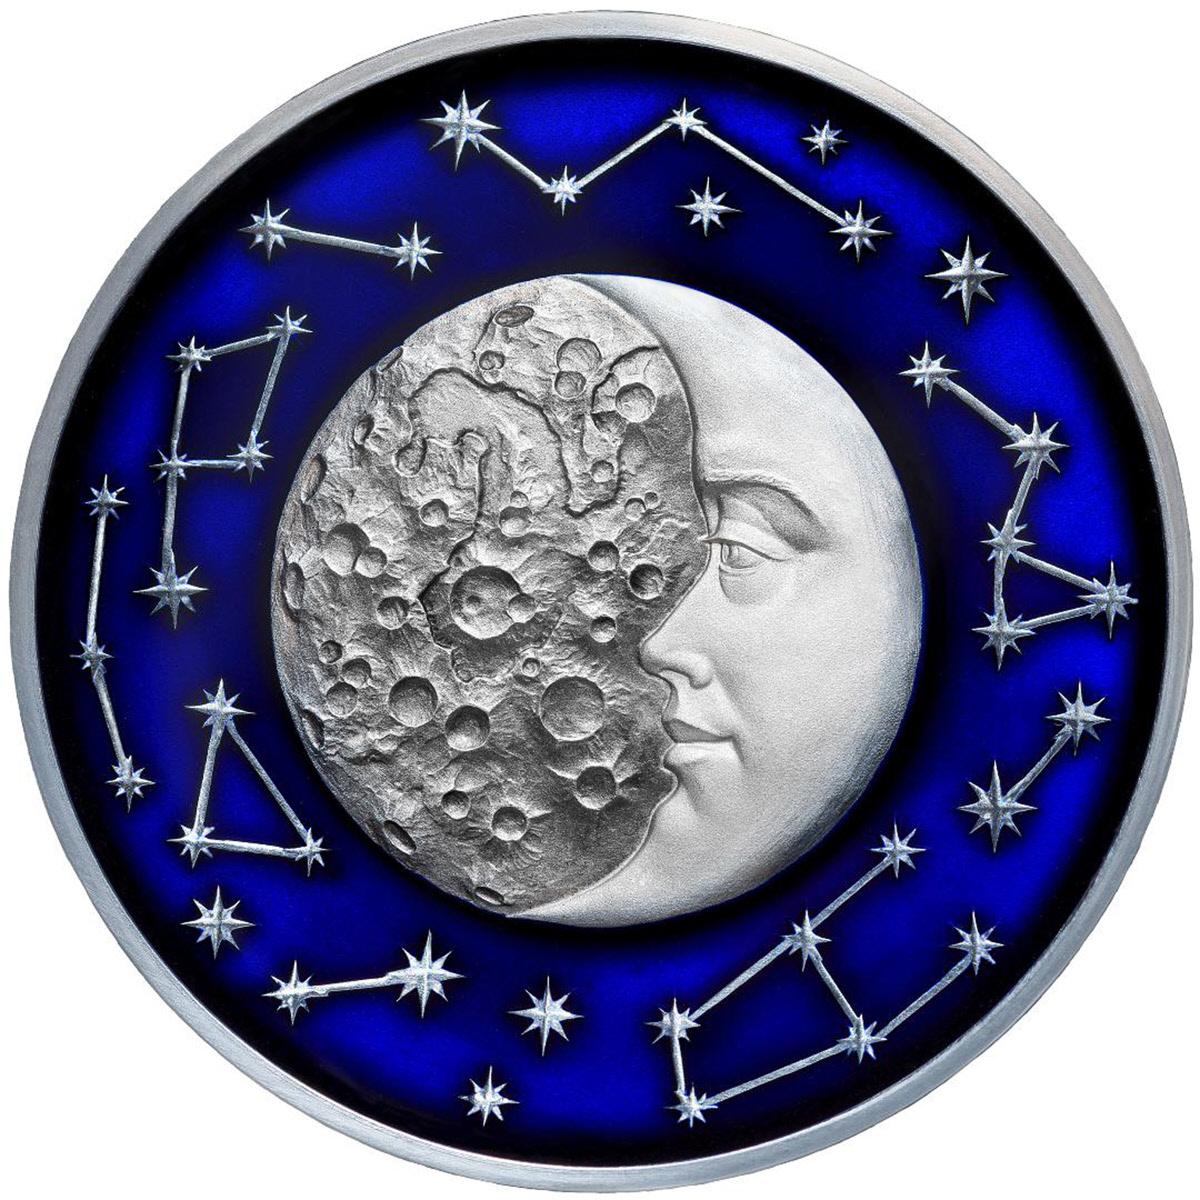 The Moon Celestial Bodies 2017 2 Oz Pure Silver Coin